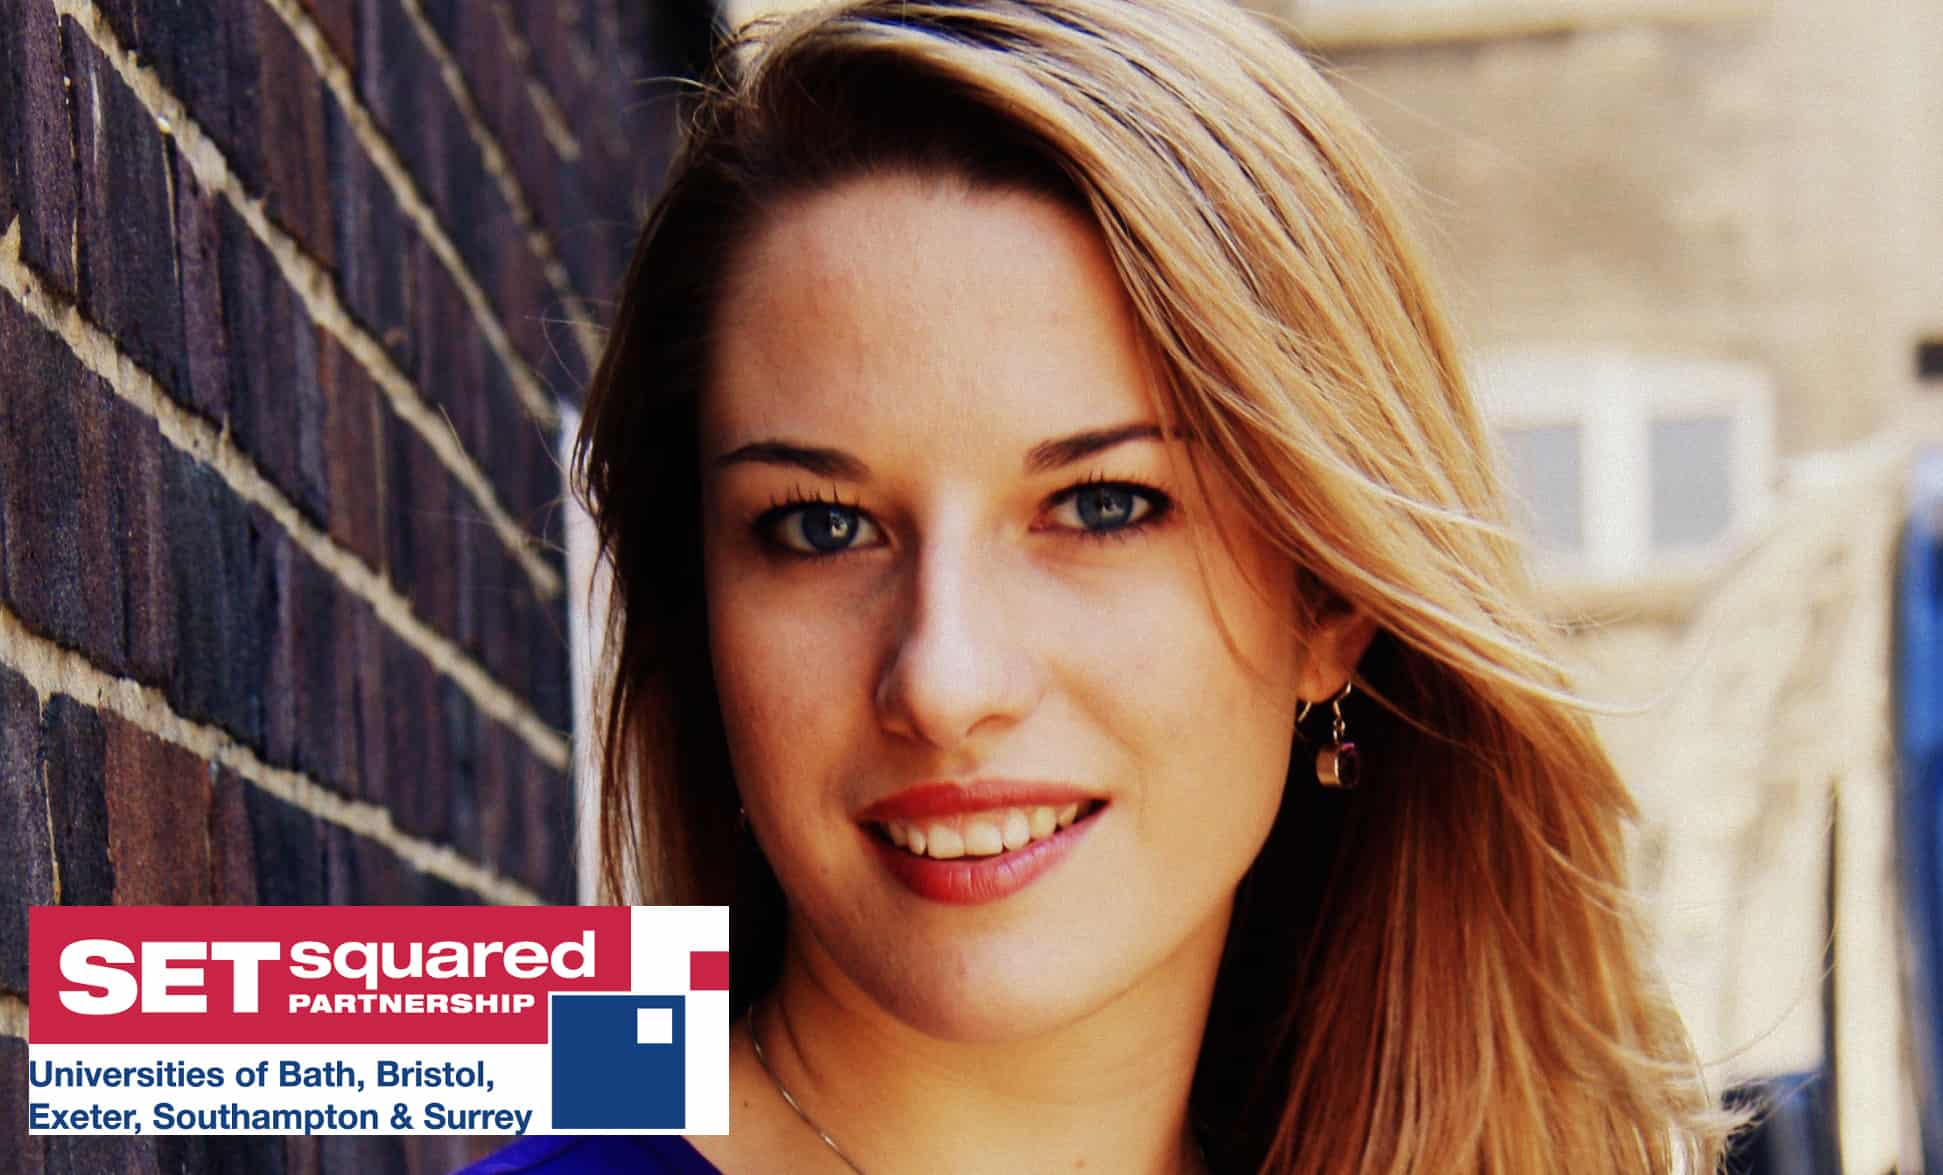 Interview: Monika Gierszewska, SETsquared's new Centre Director for Bristol